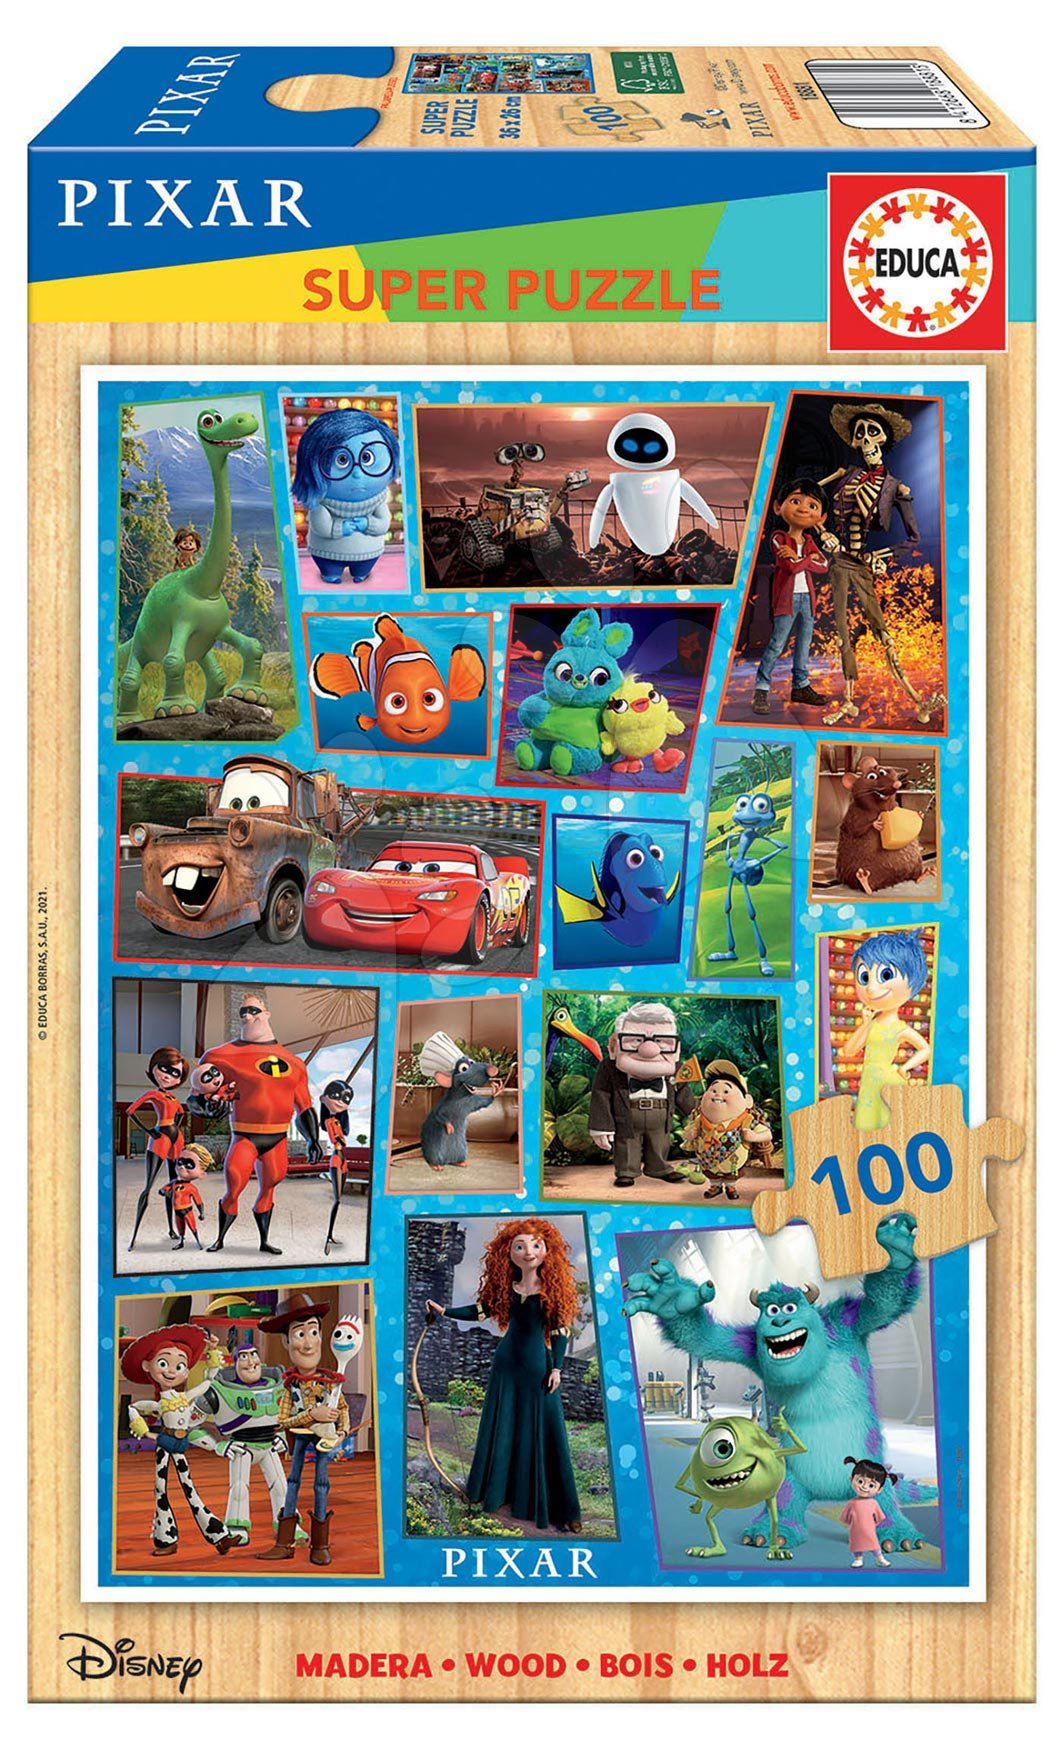 Dřevěné puzzle Pixar Disney Educa 100 dílů od 5 let